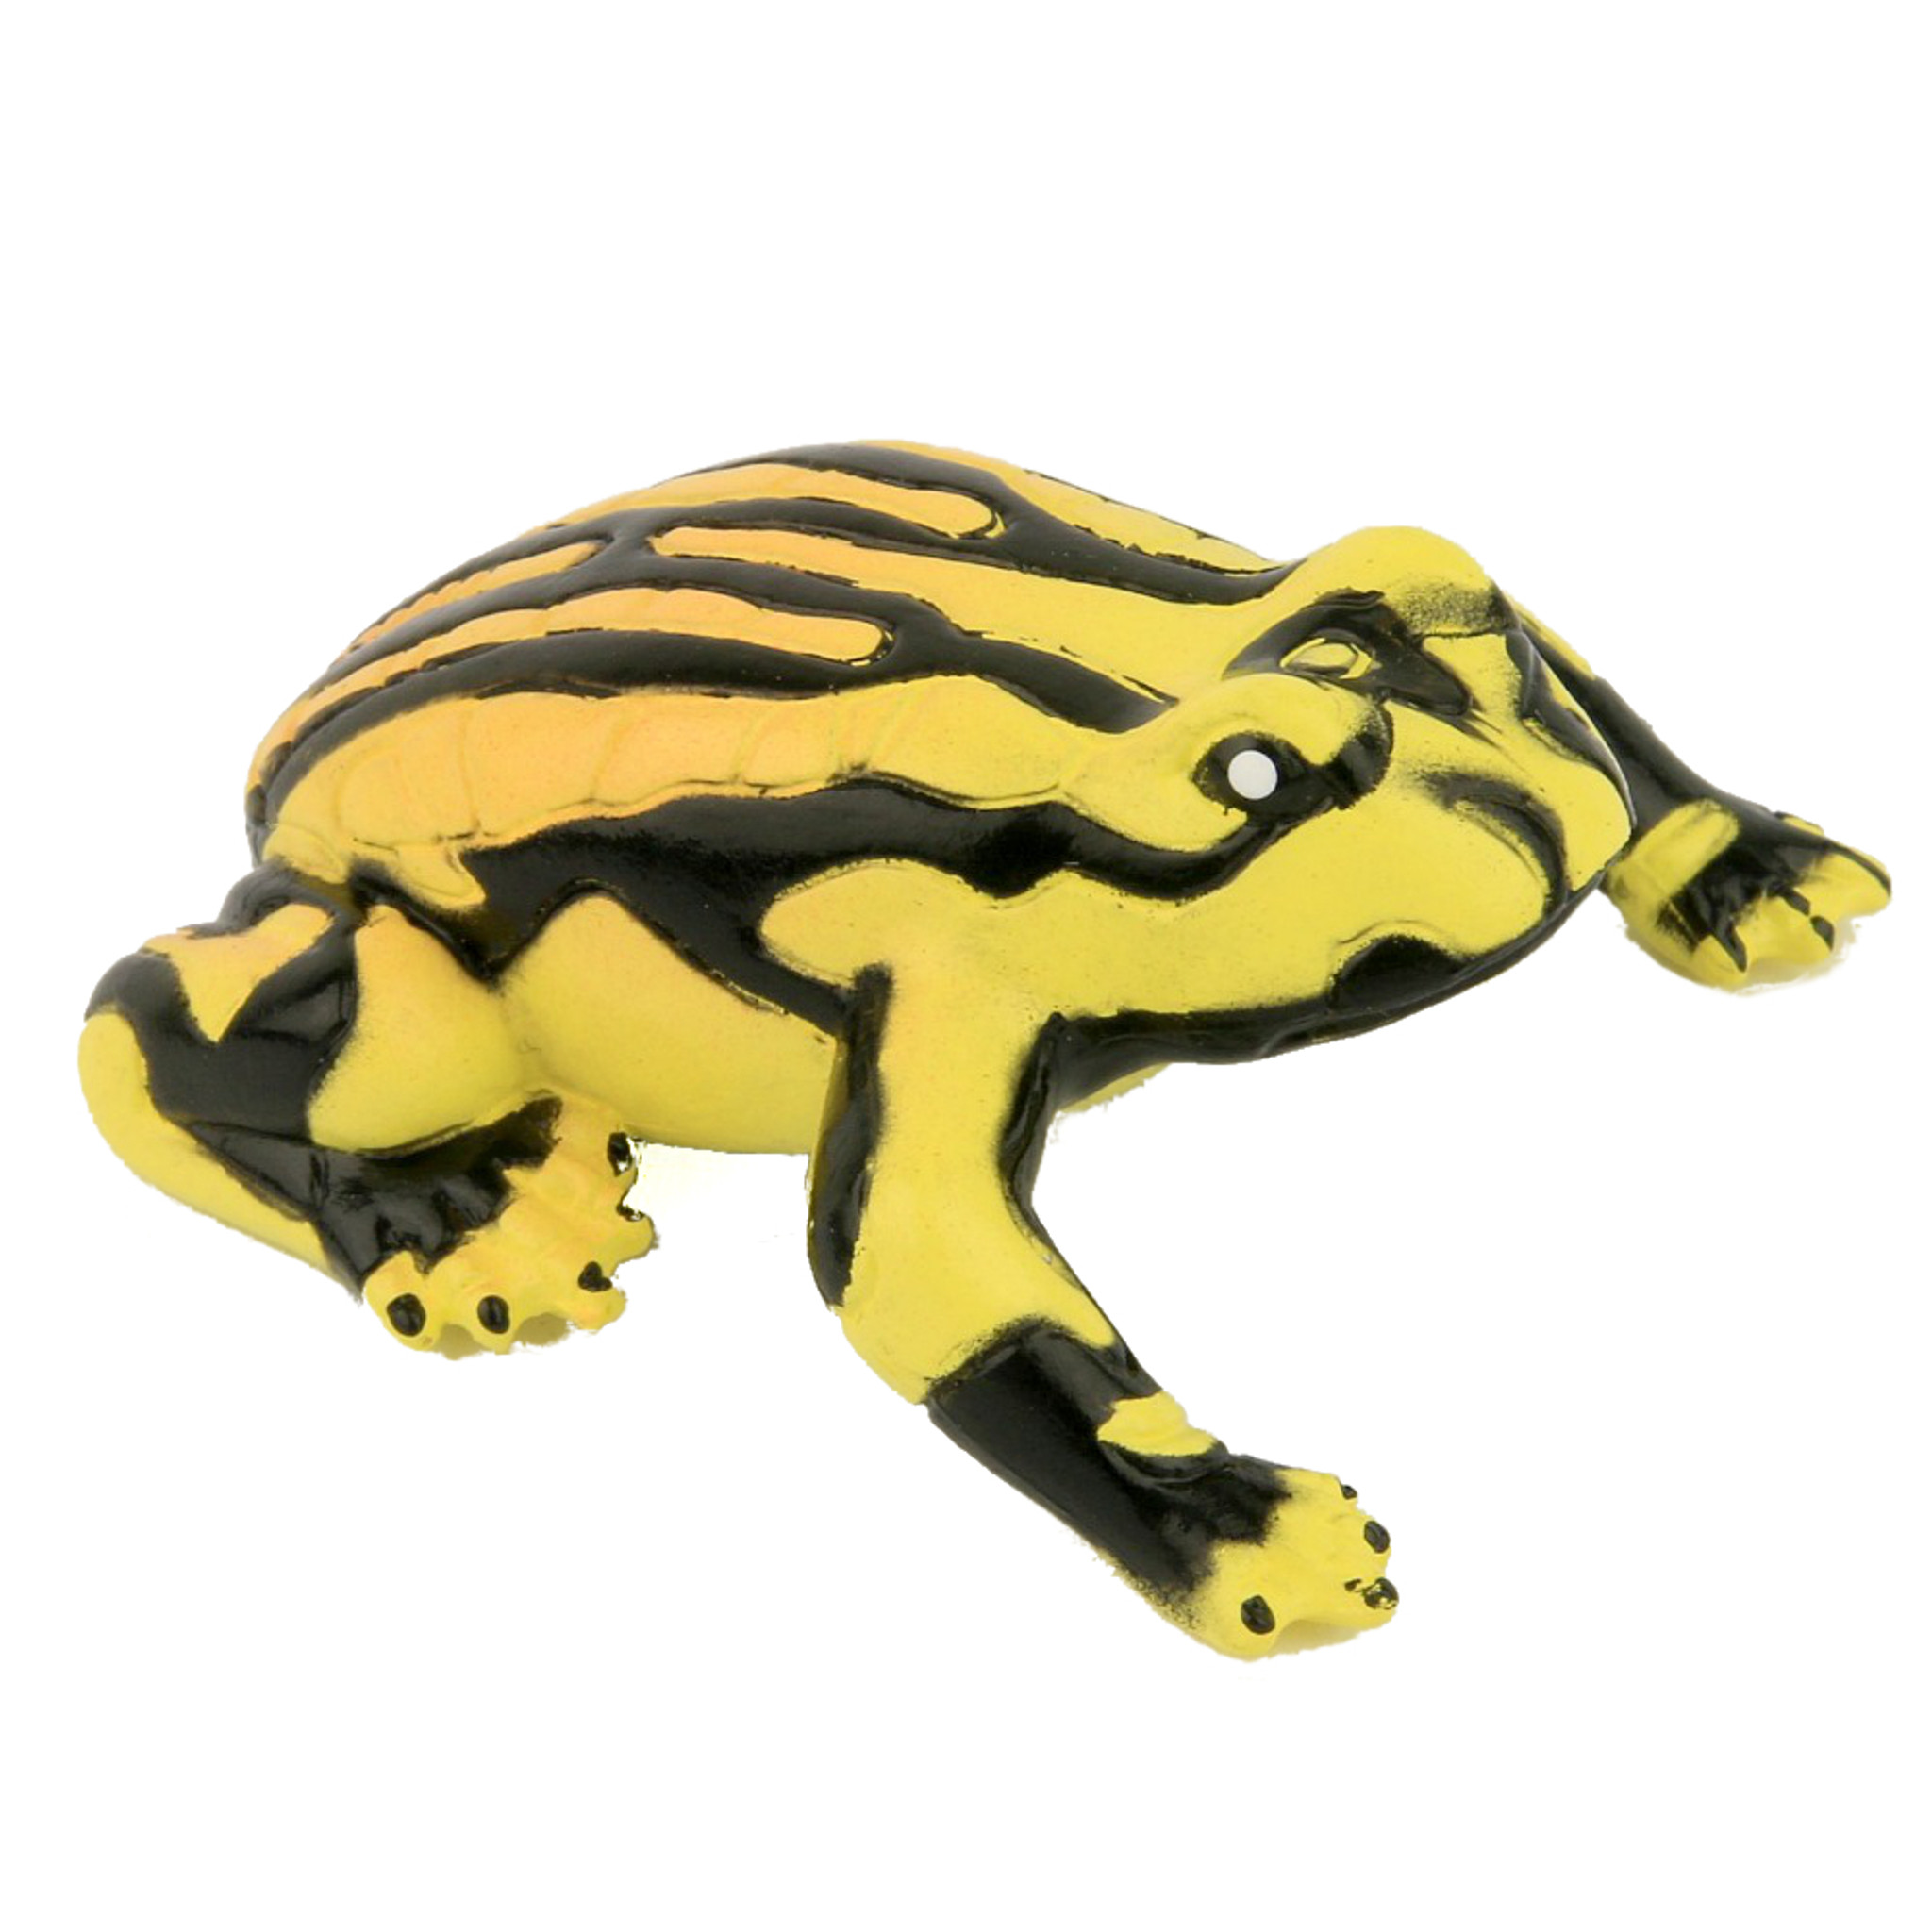 : vinyl toy animal figure Science and Nature Australia Coroboree Frog 75361